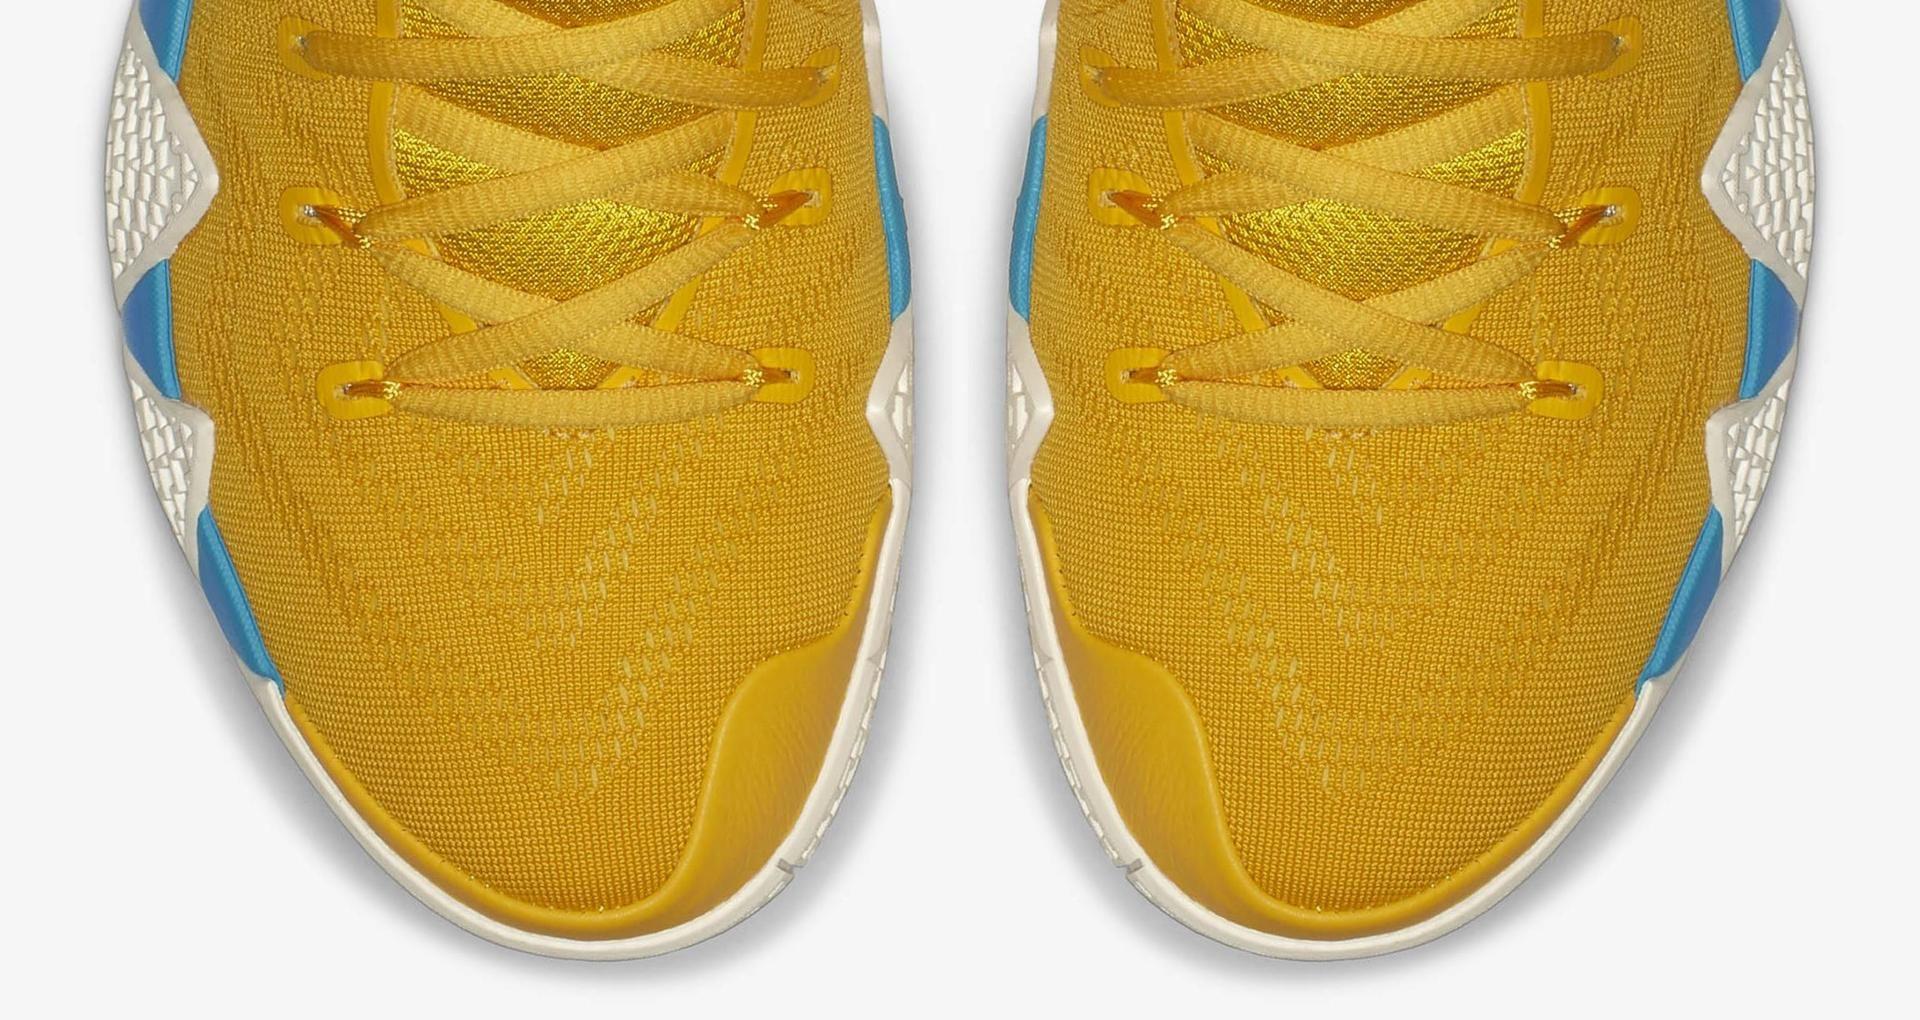 separation shoes 13a74 11149 Nike Kyrie 4 'Kix' Release Date. Nike+ SNKRS